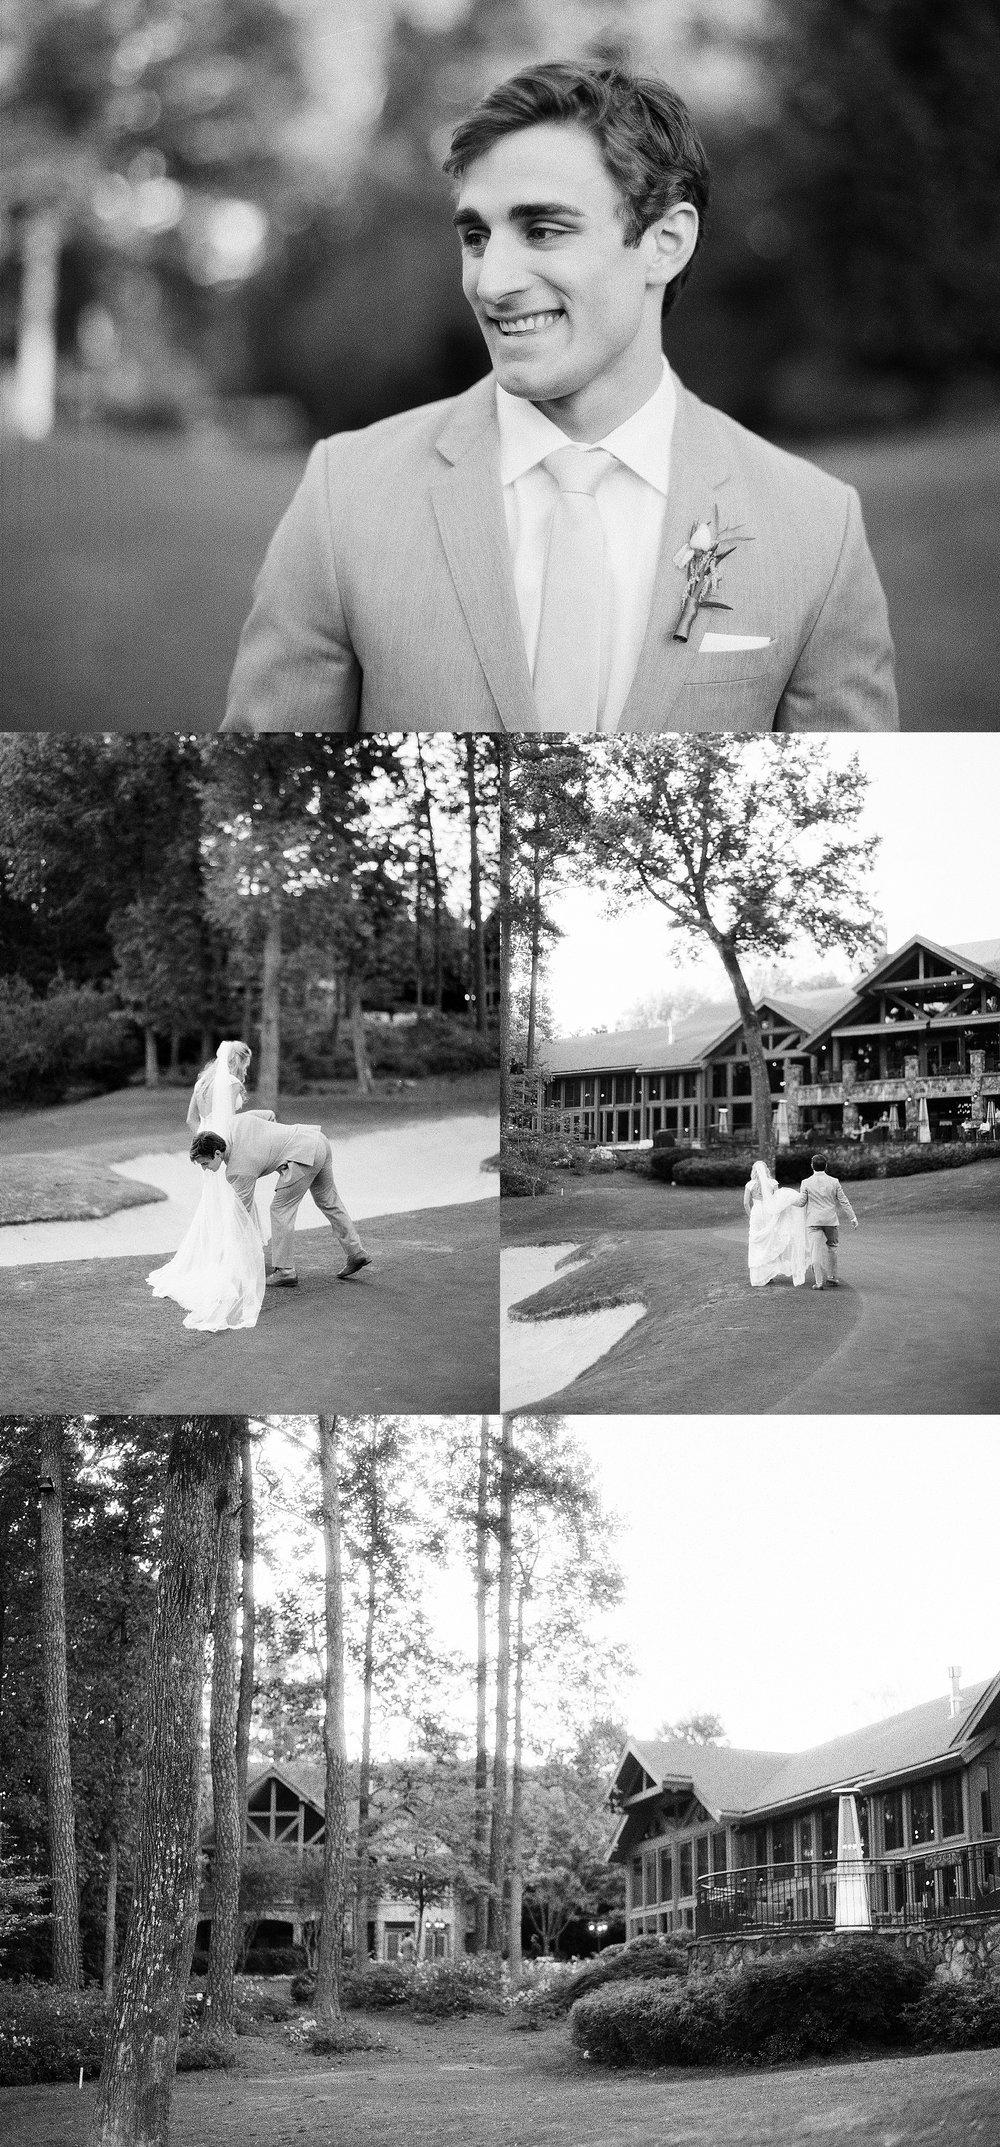 252country-club-johns-creek-wedding-anderson-.jpg